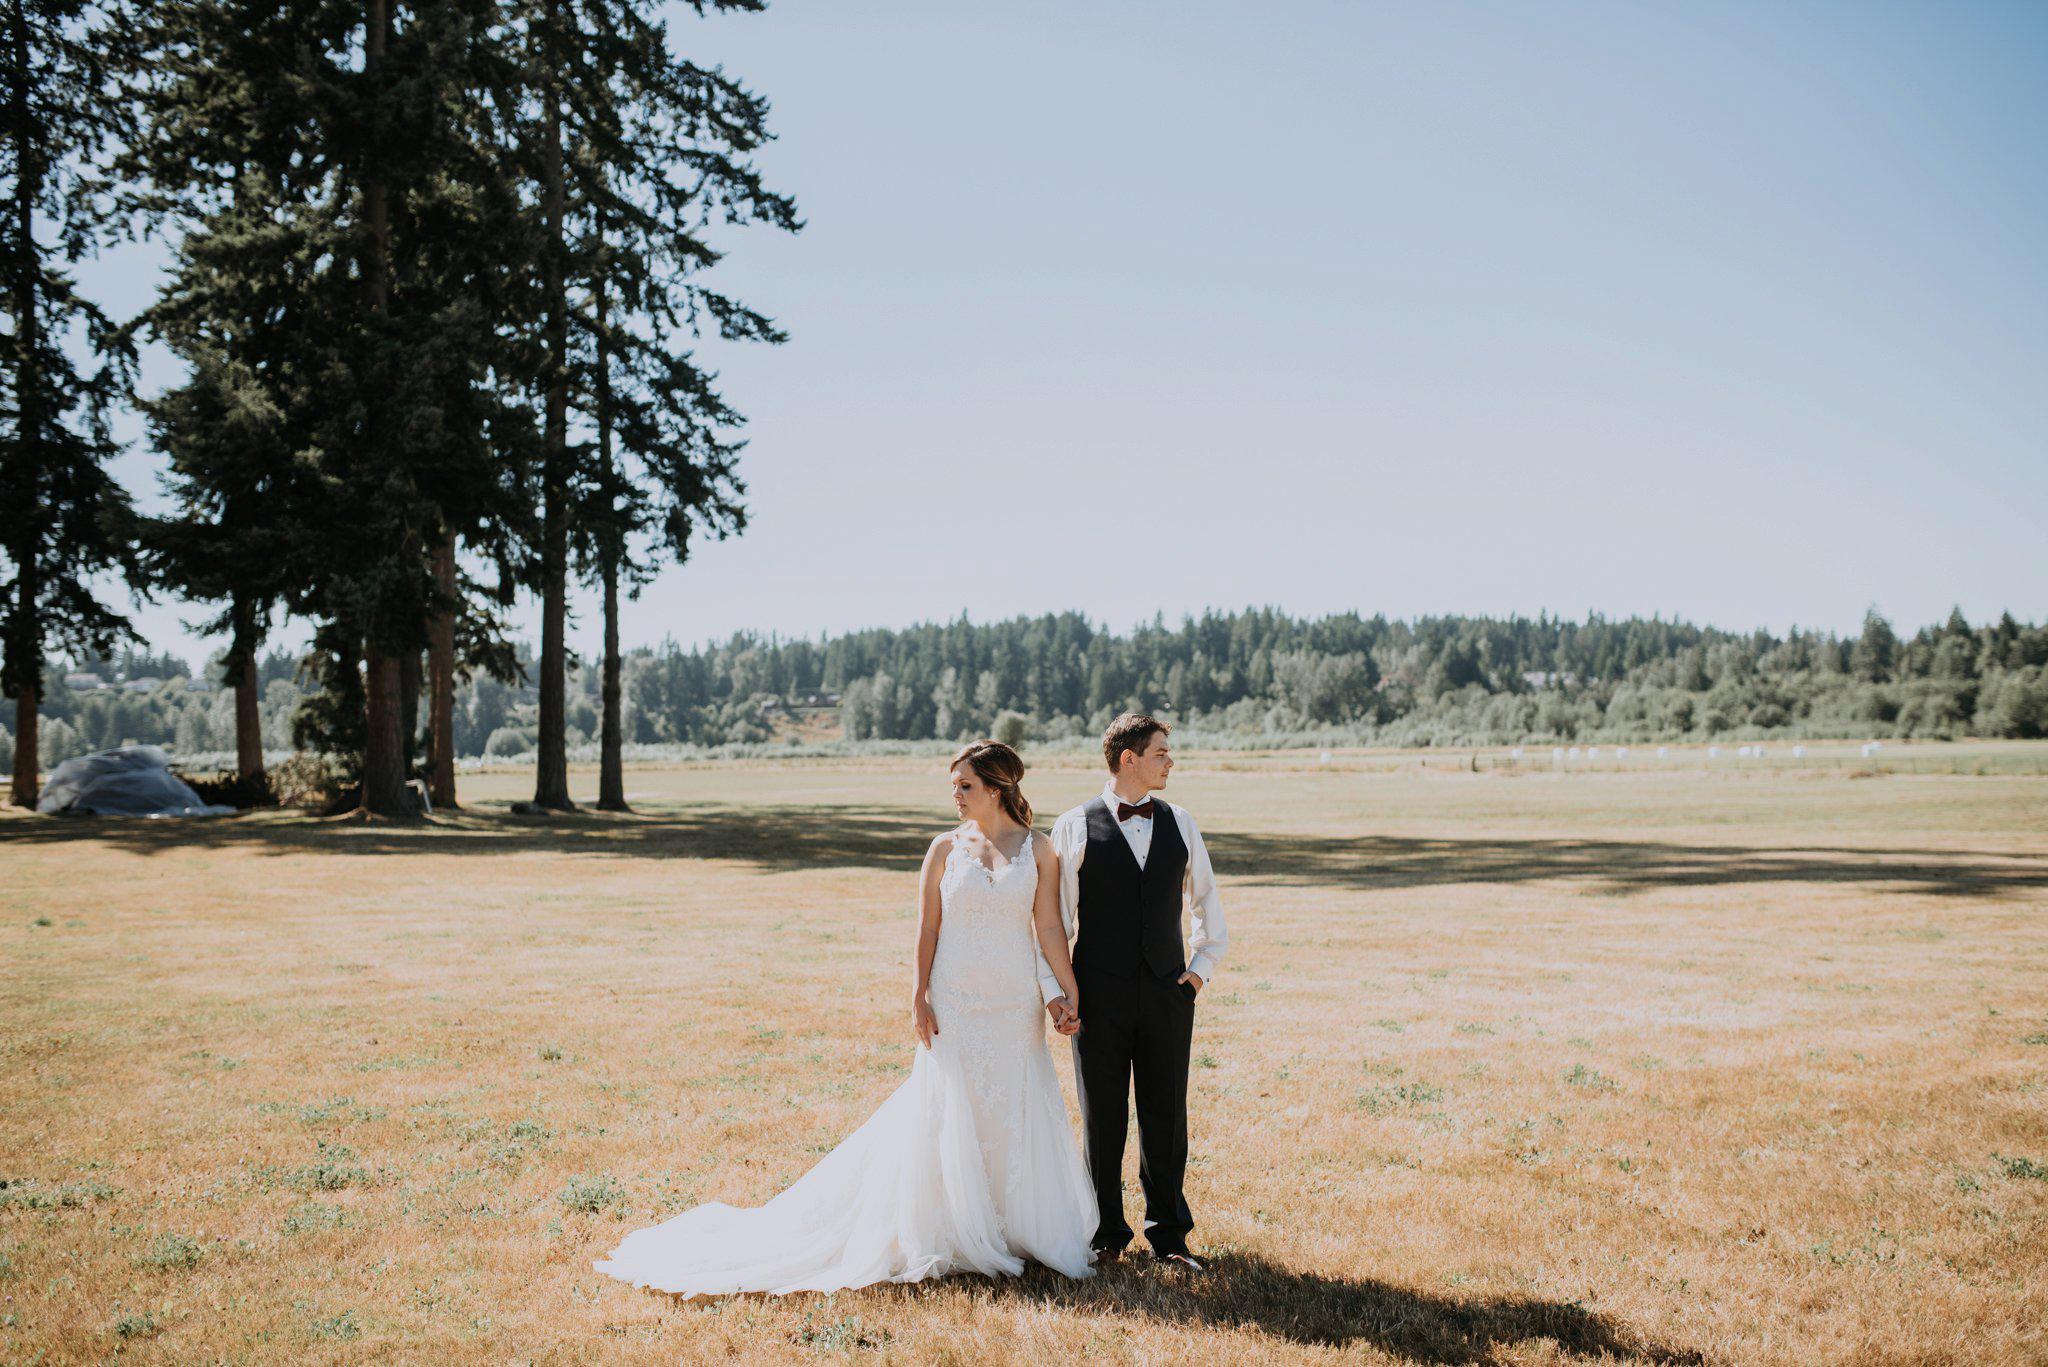 kristen-and-cody-the-kelley-farm-wedding-seattle-photographer-caitlyn-nikula-47.jpg